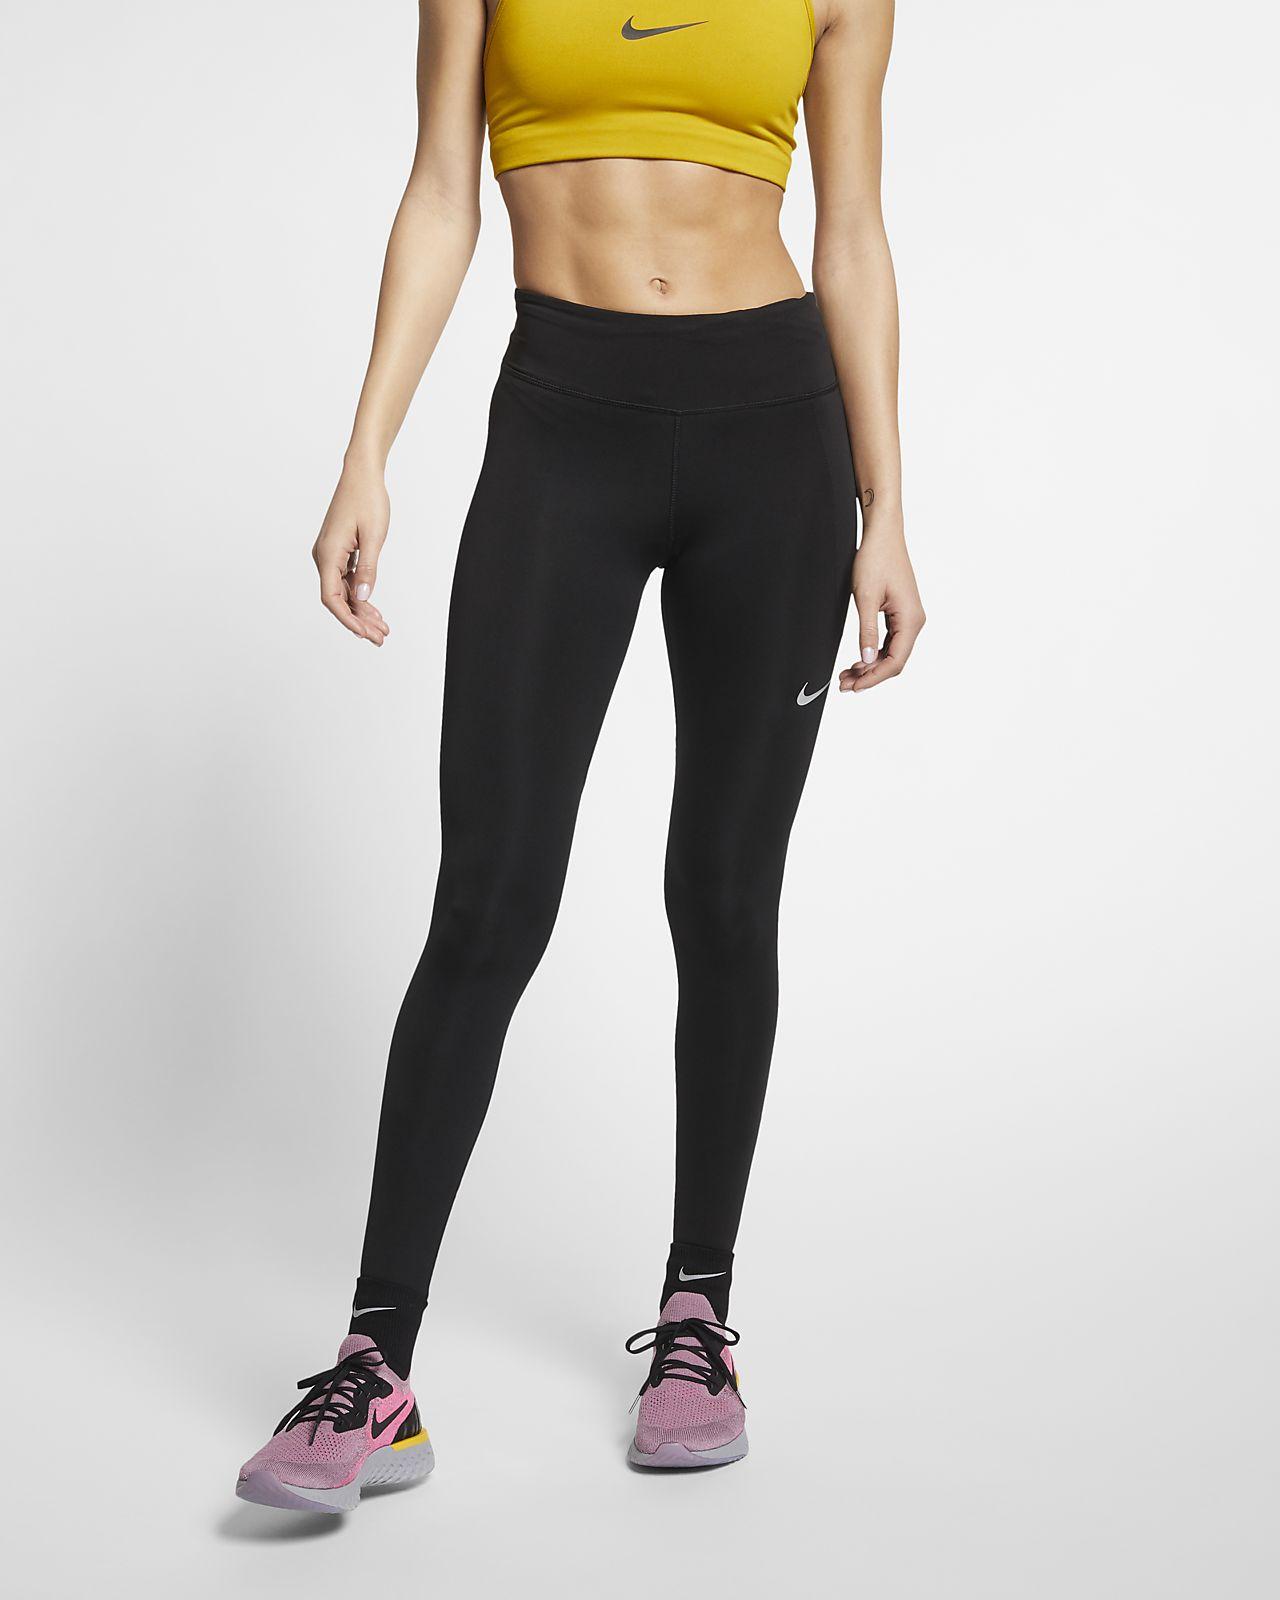 Nike Fast Malles de running - Dona